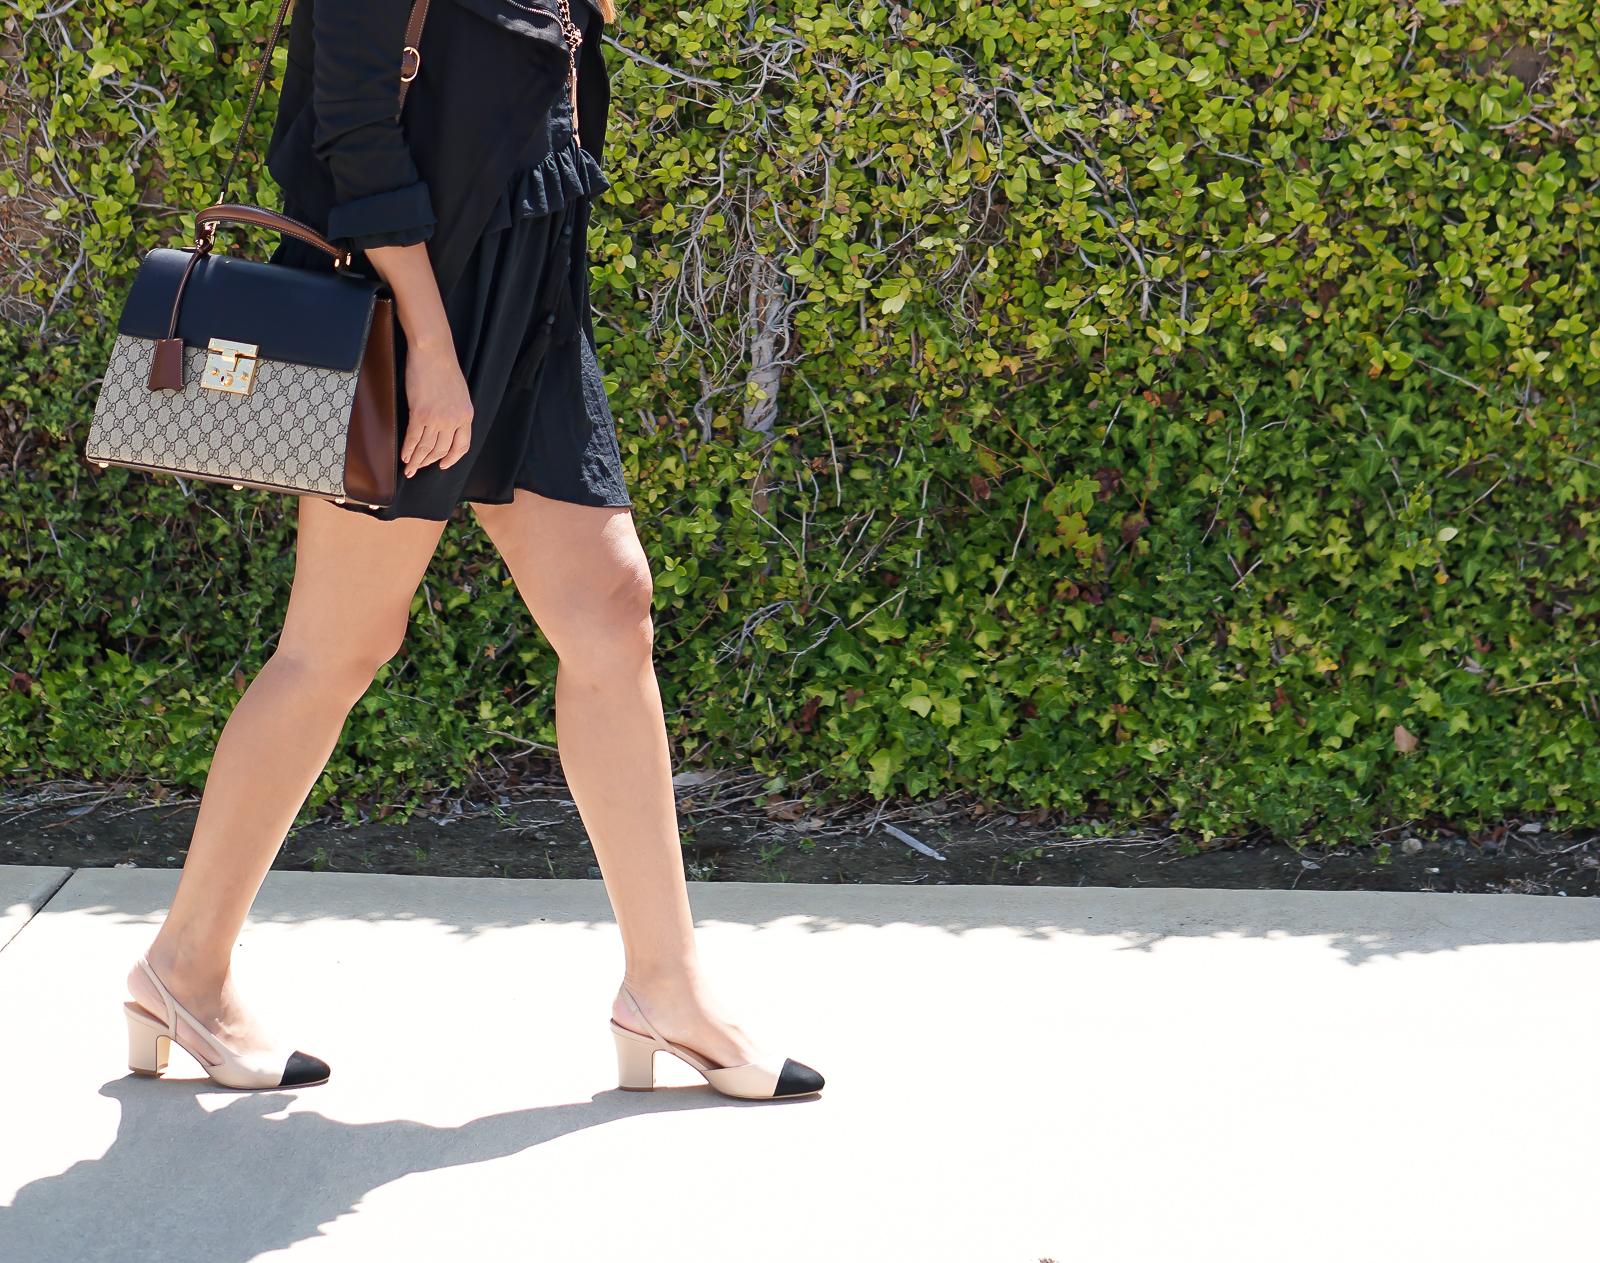 Chanel Slingback Dupes, Chanel Dupe, Splurge vs Save, H&M Dress, Ivanka Trump Heels, Guess Necklace, Gucci Bag,